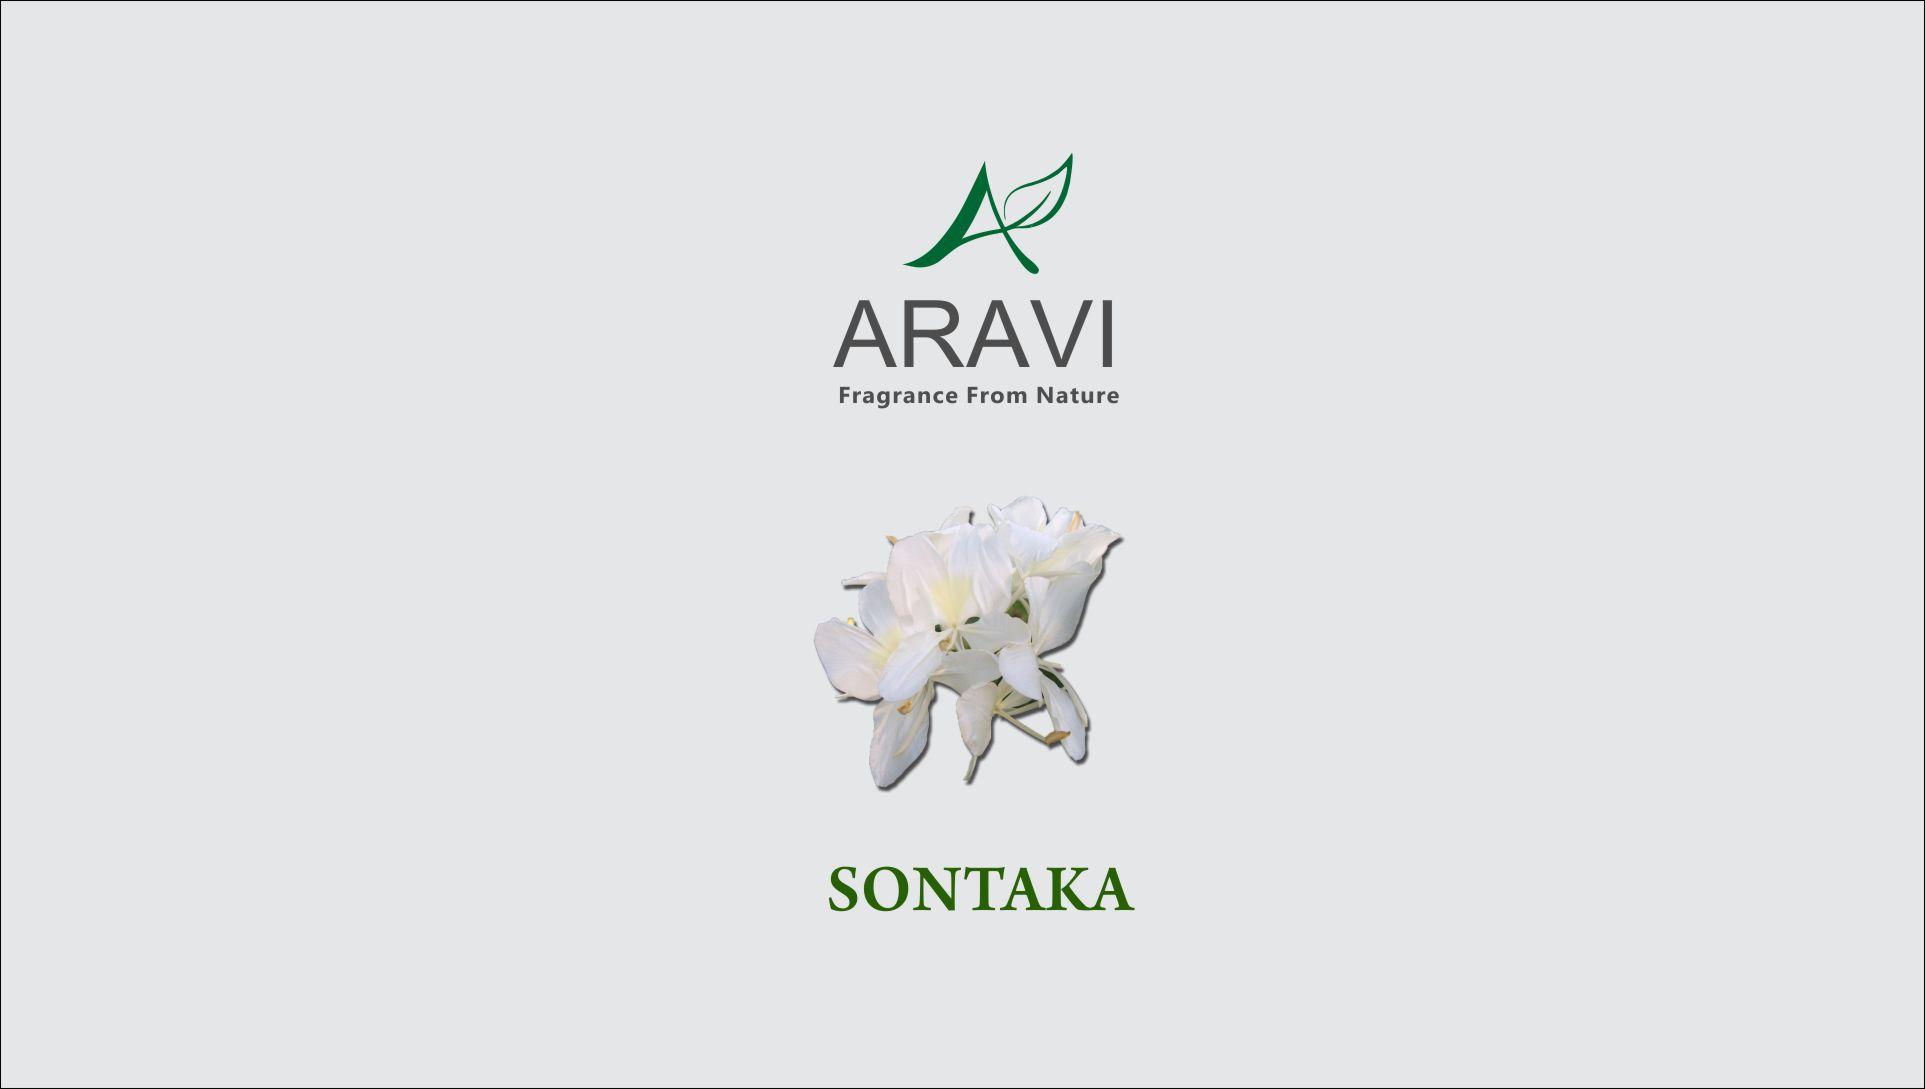 Sontaka